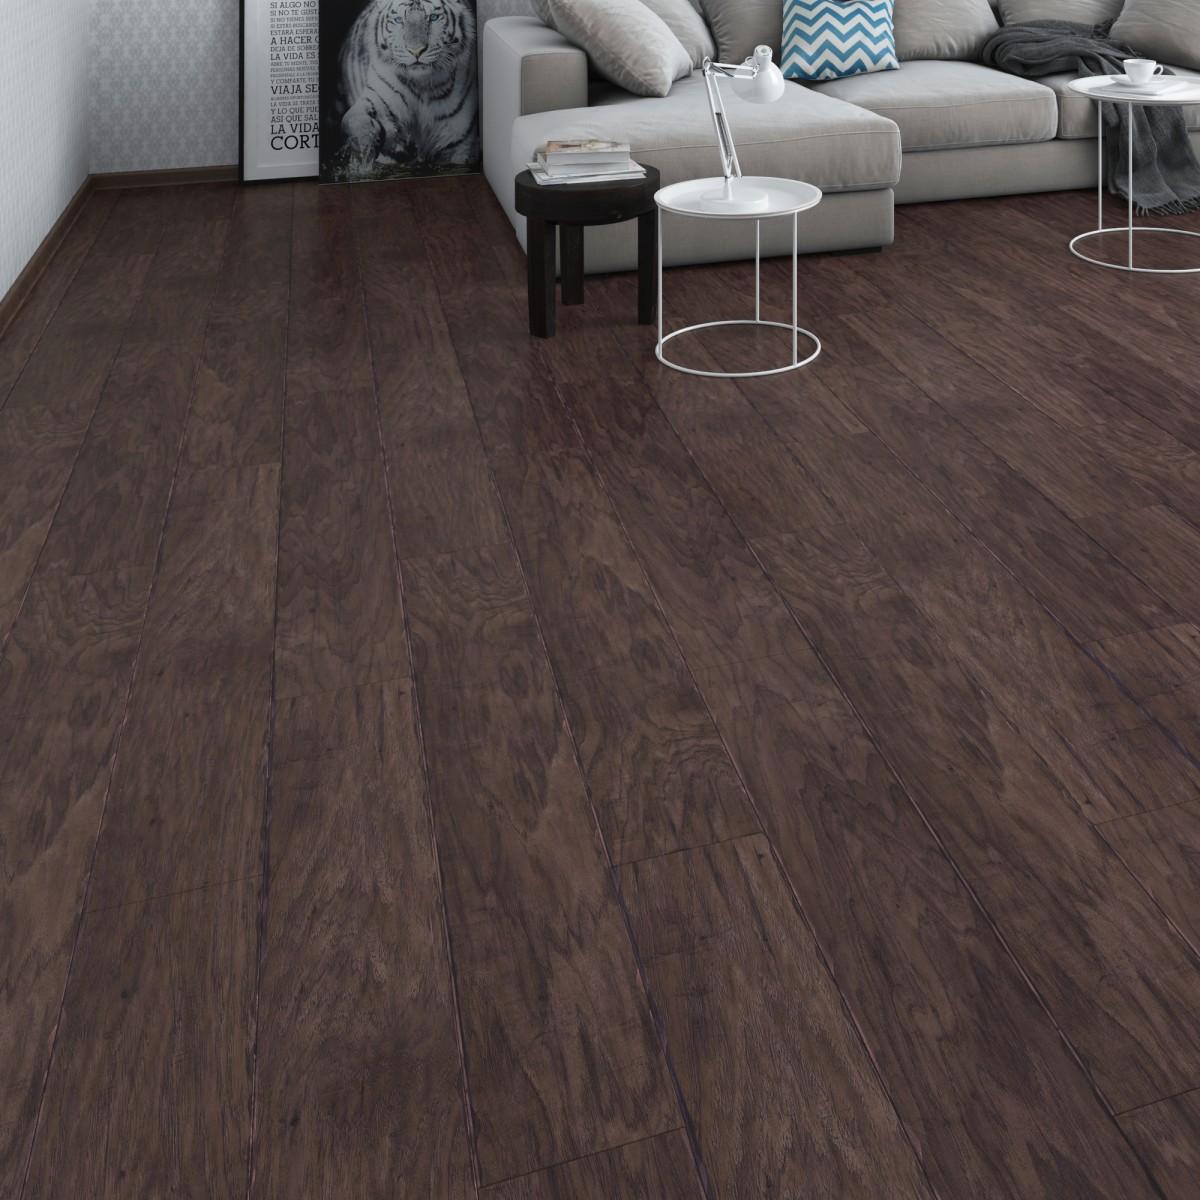 Ламинат Artens Хикори замшевый 33 класс толщина 8 мм 2.162 м²